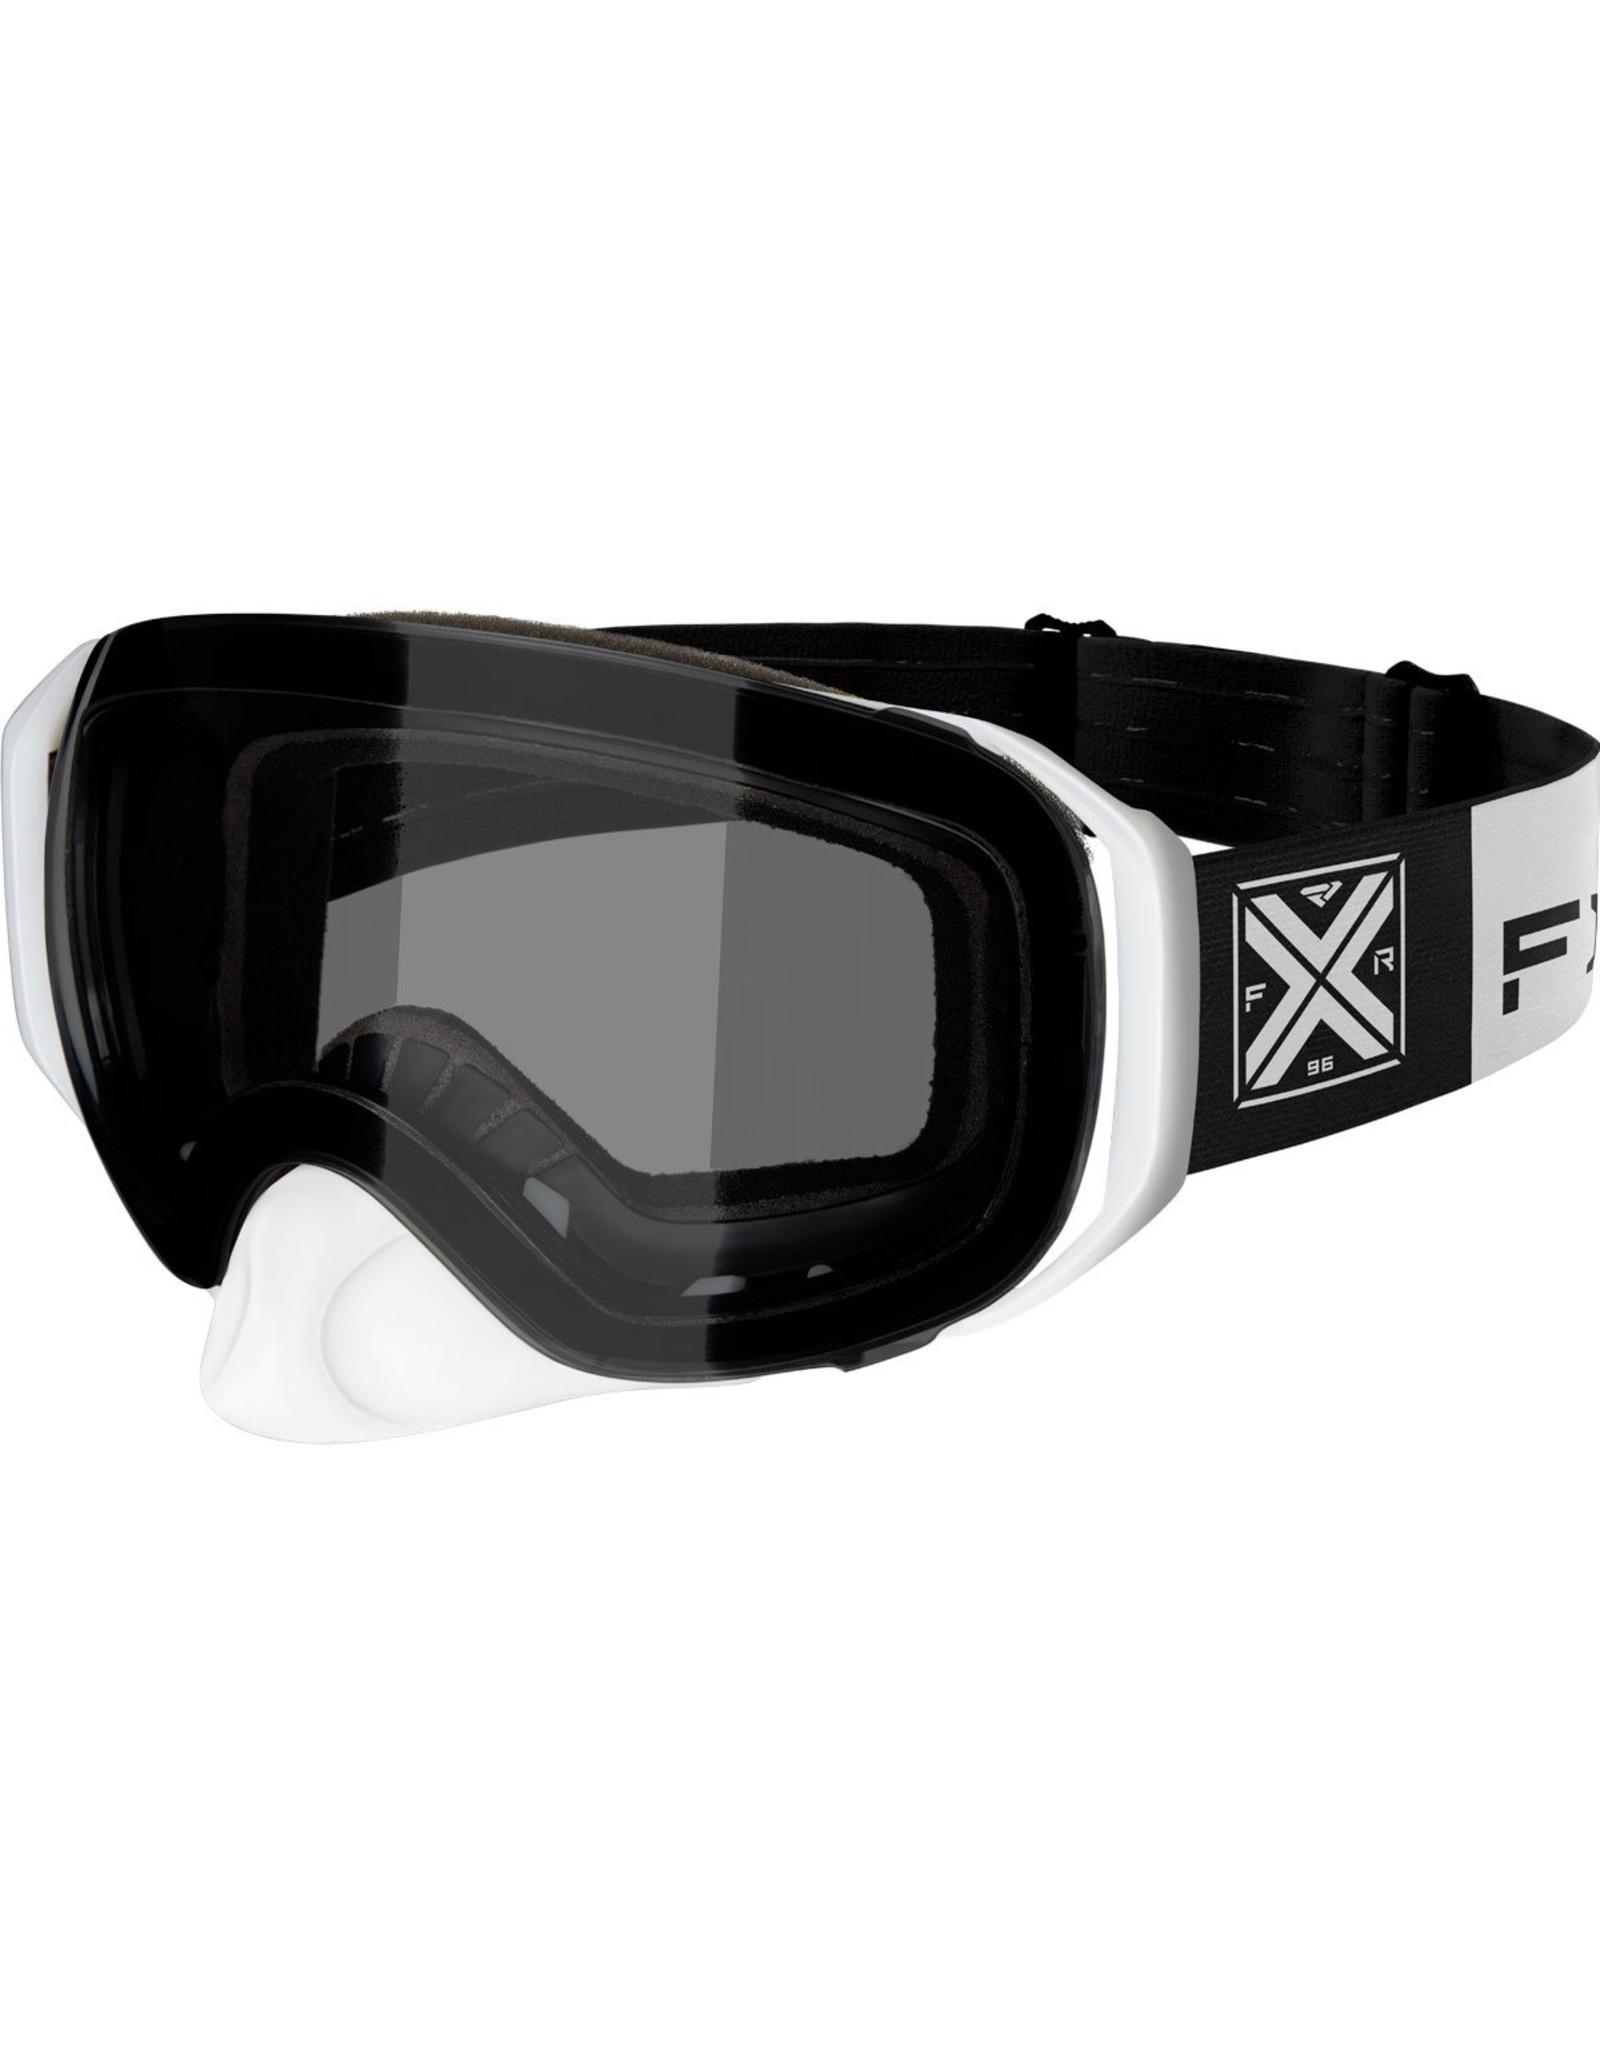 FXR Summit Goggle